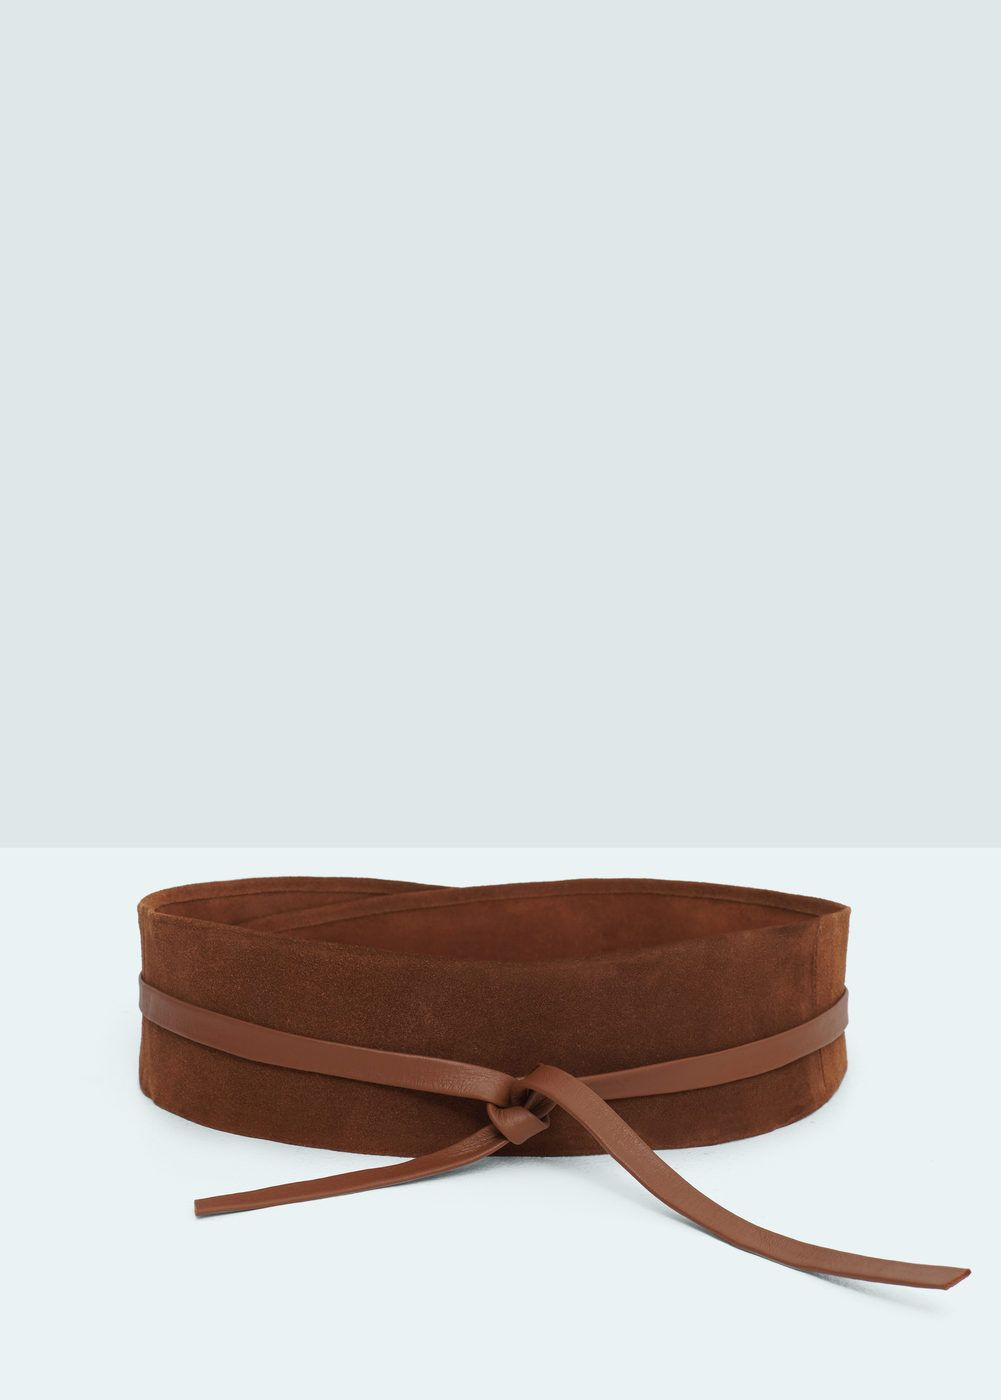 Cinturón fajín piel camel de MANGO (SS16) por 12 235c77279082